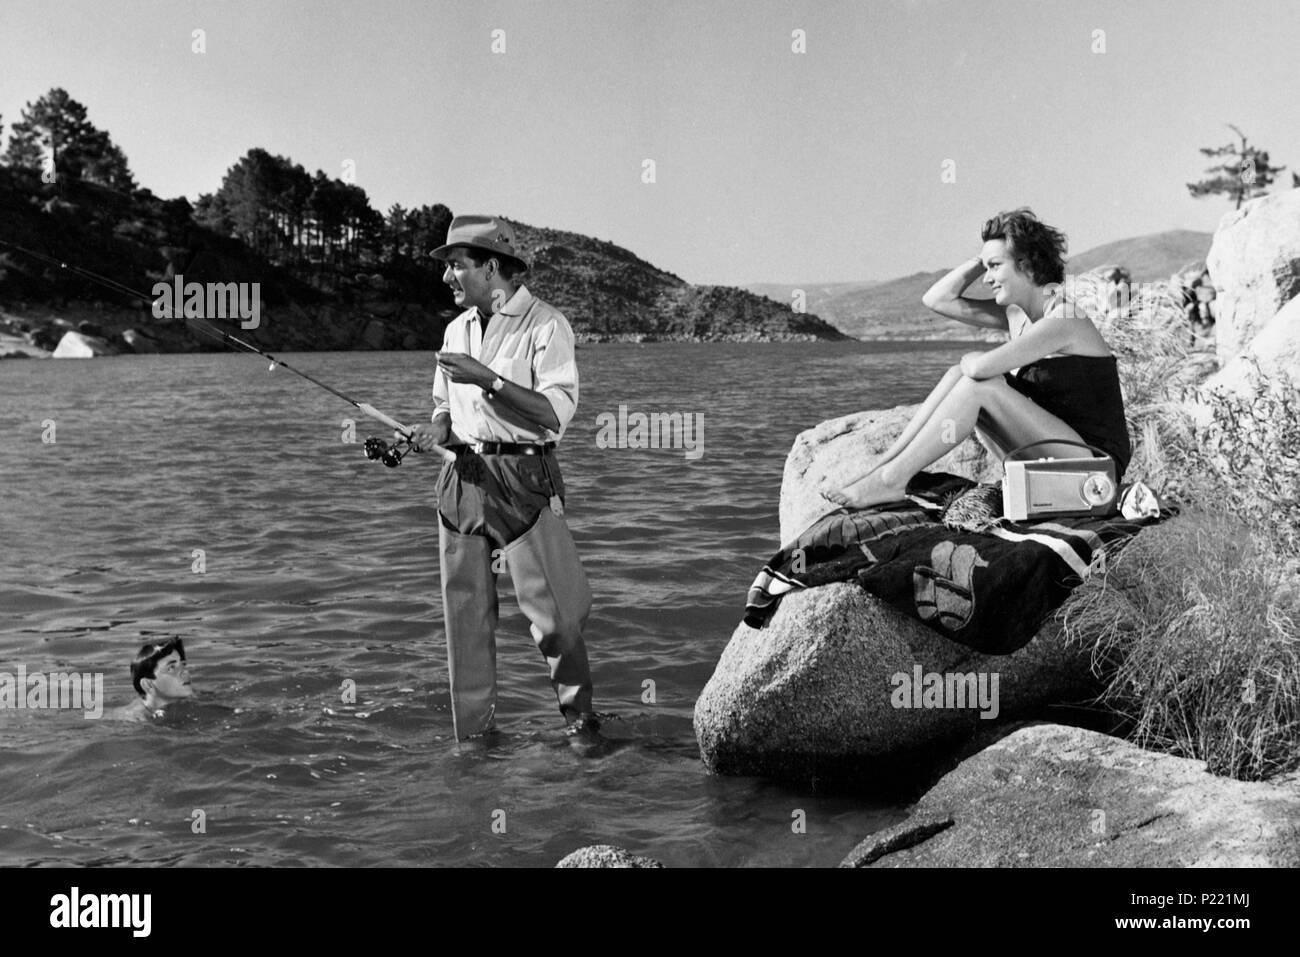 Original Film Title: MARIA, MATRICULA DE BILBAO.  English Title: MARIA, MATRICULA DE BILBAO.  Film Director: LADISLAO VAJDA.  Year: 1960. Stock Photo